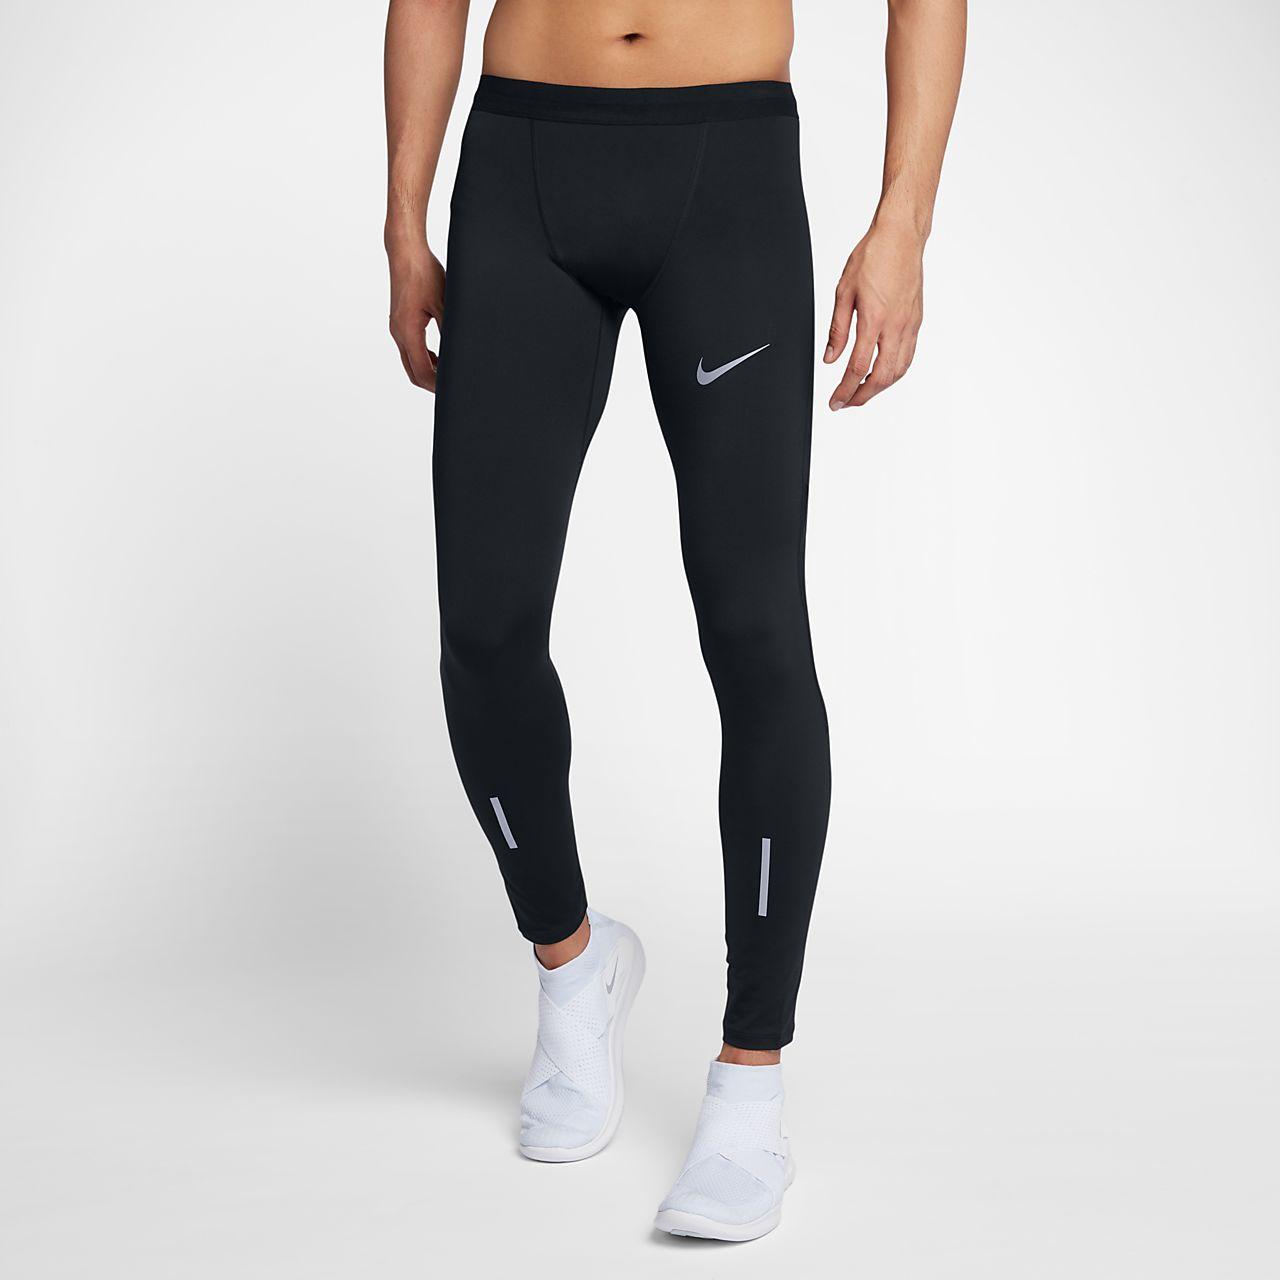 Herren Nike Running Nike Running Power Tech Reflektierende